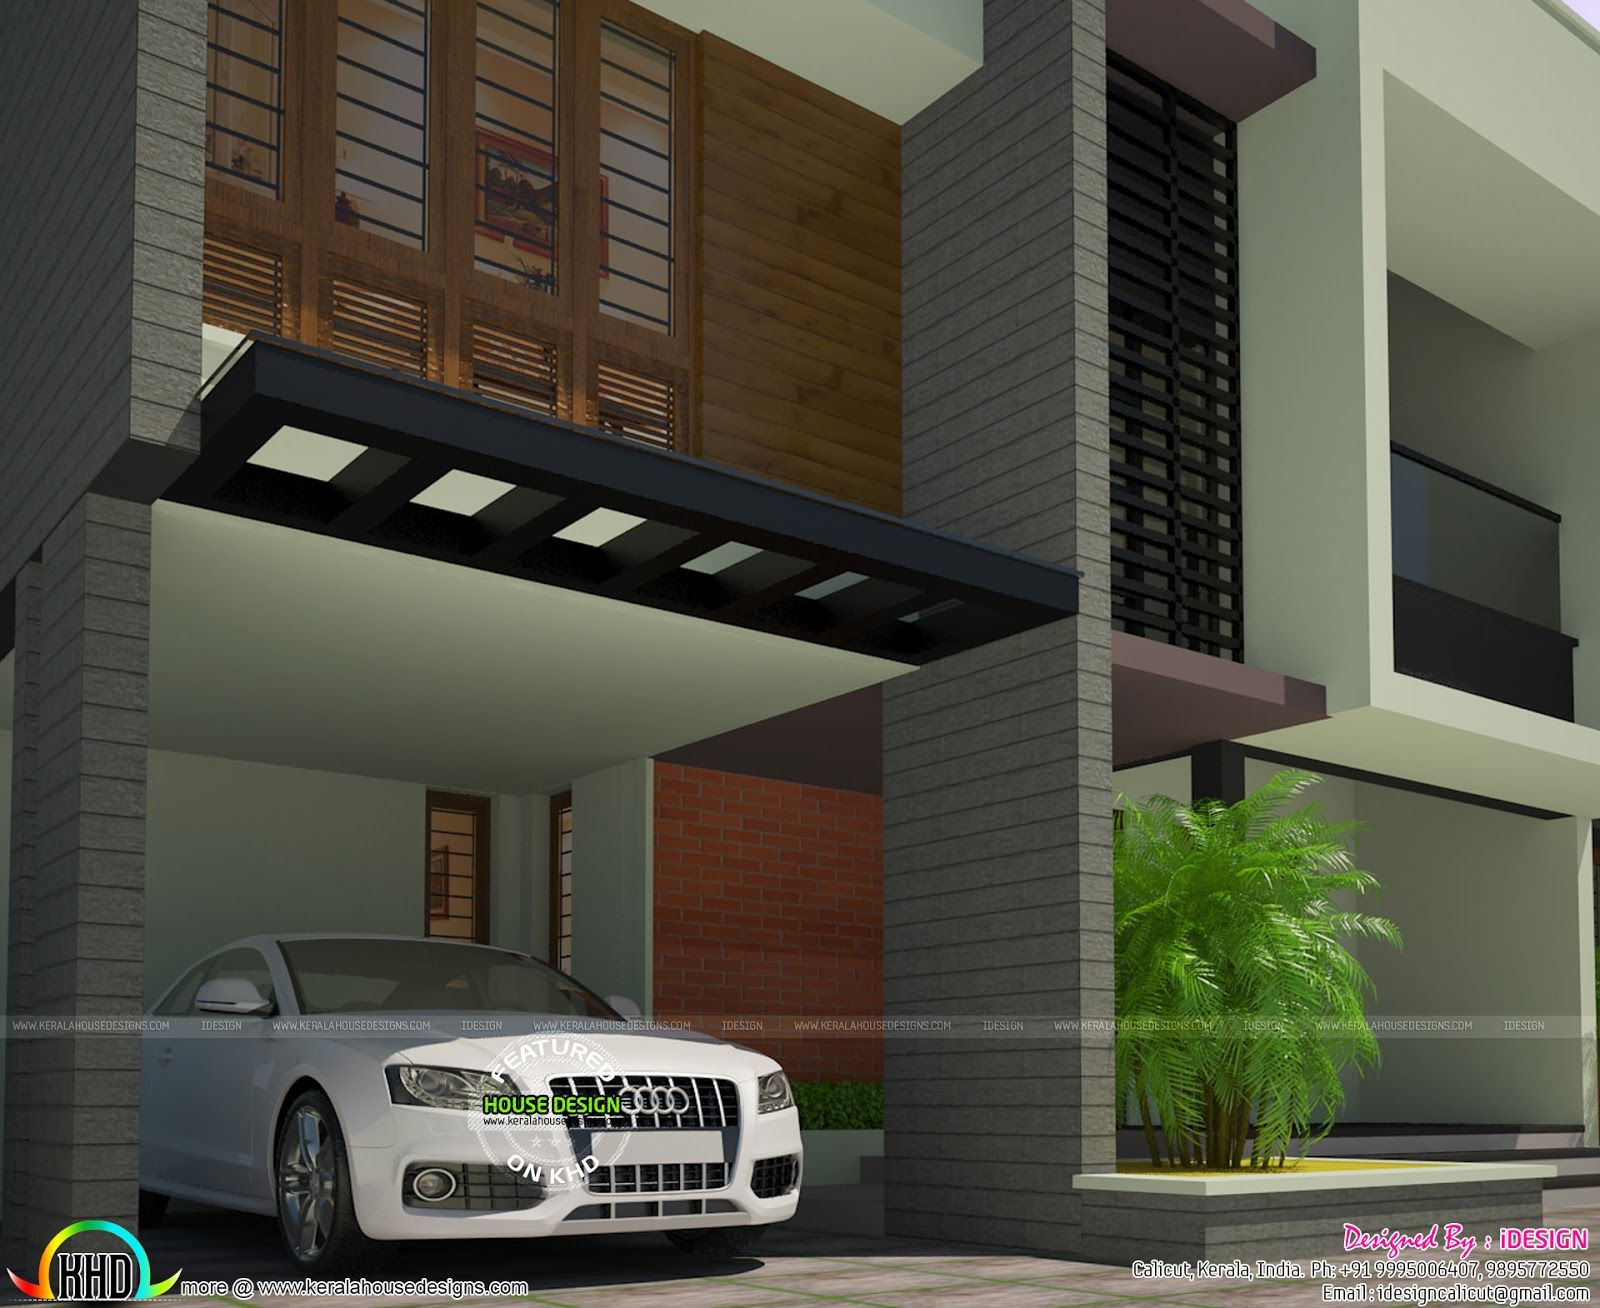 Housedesignelementg building pinterest